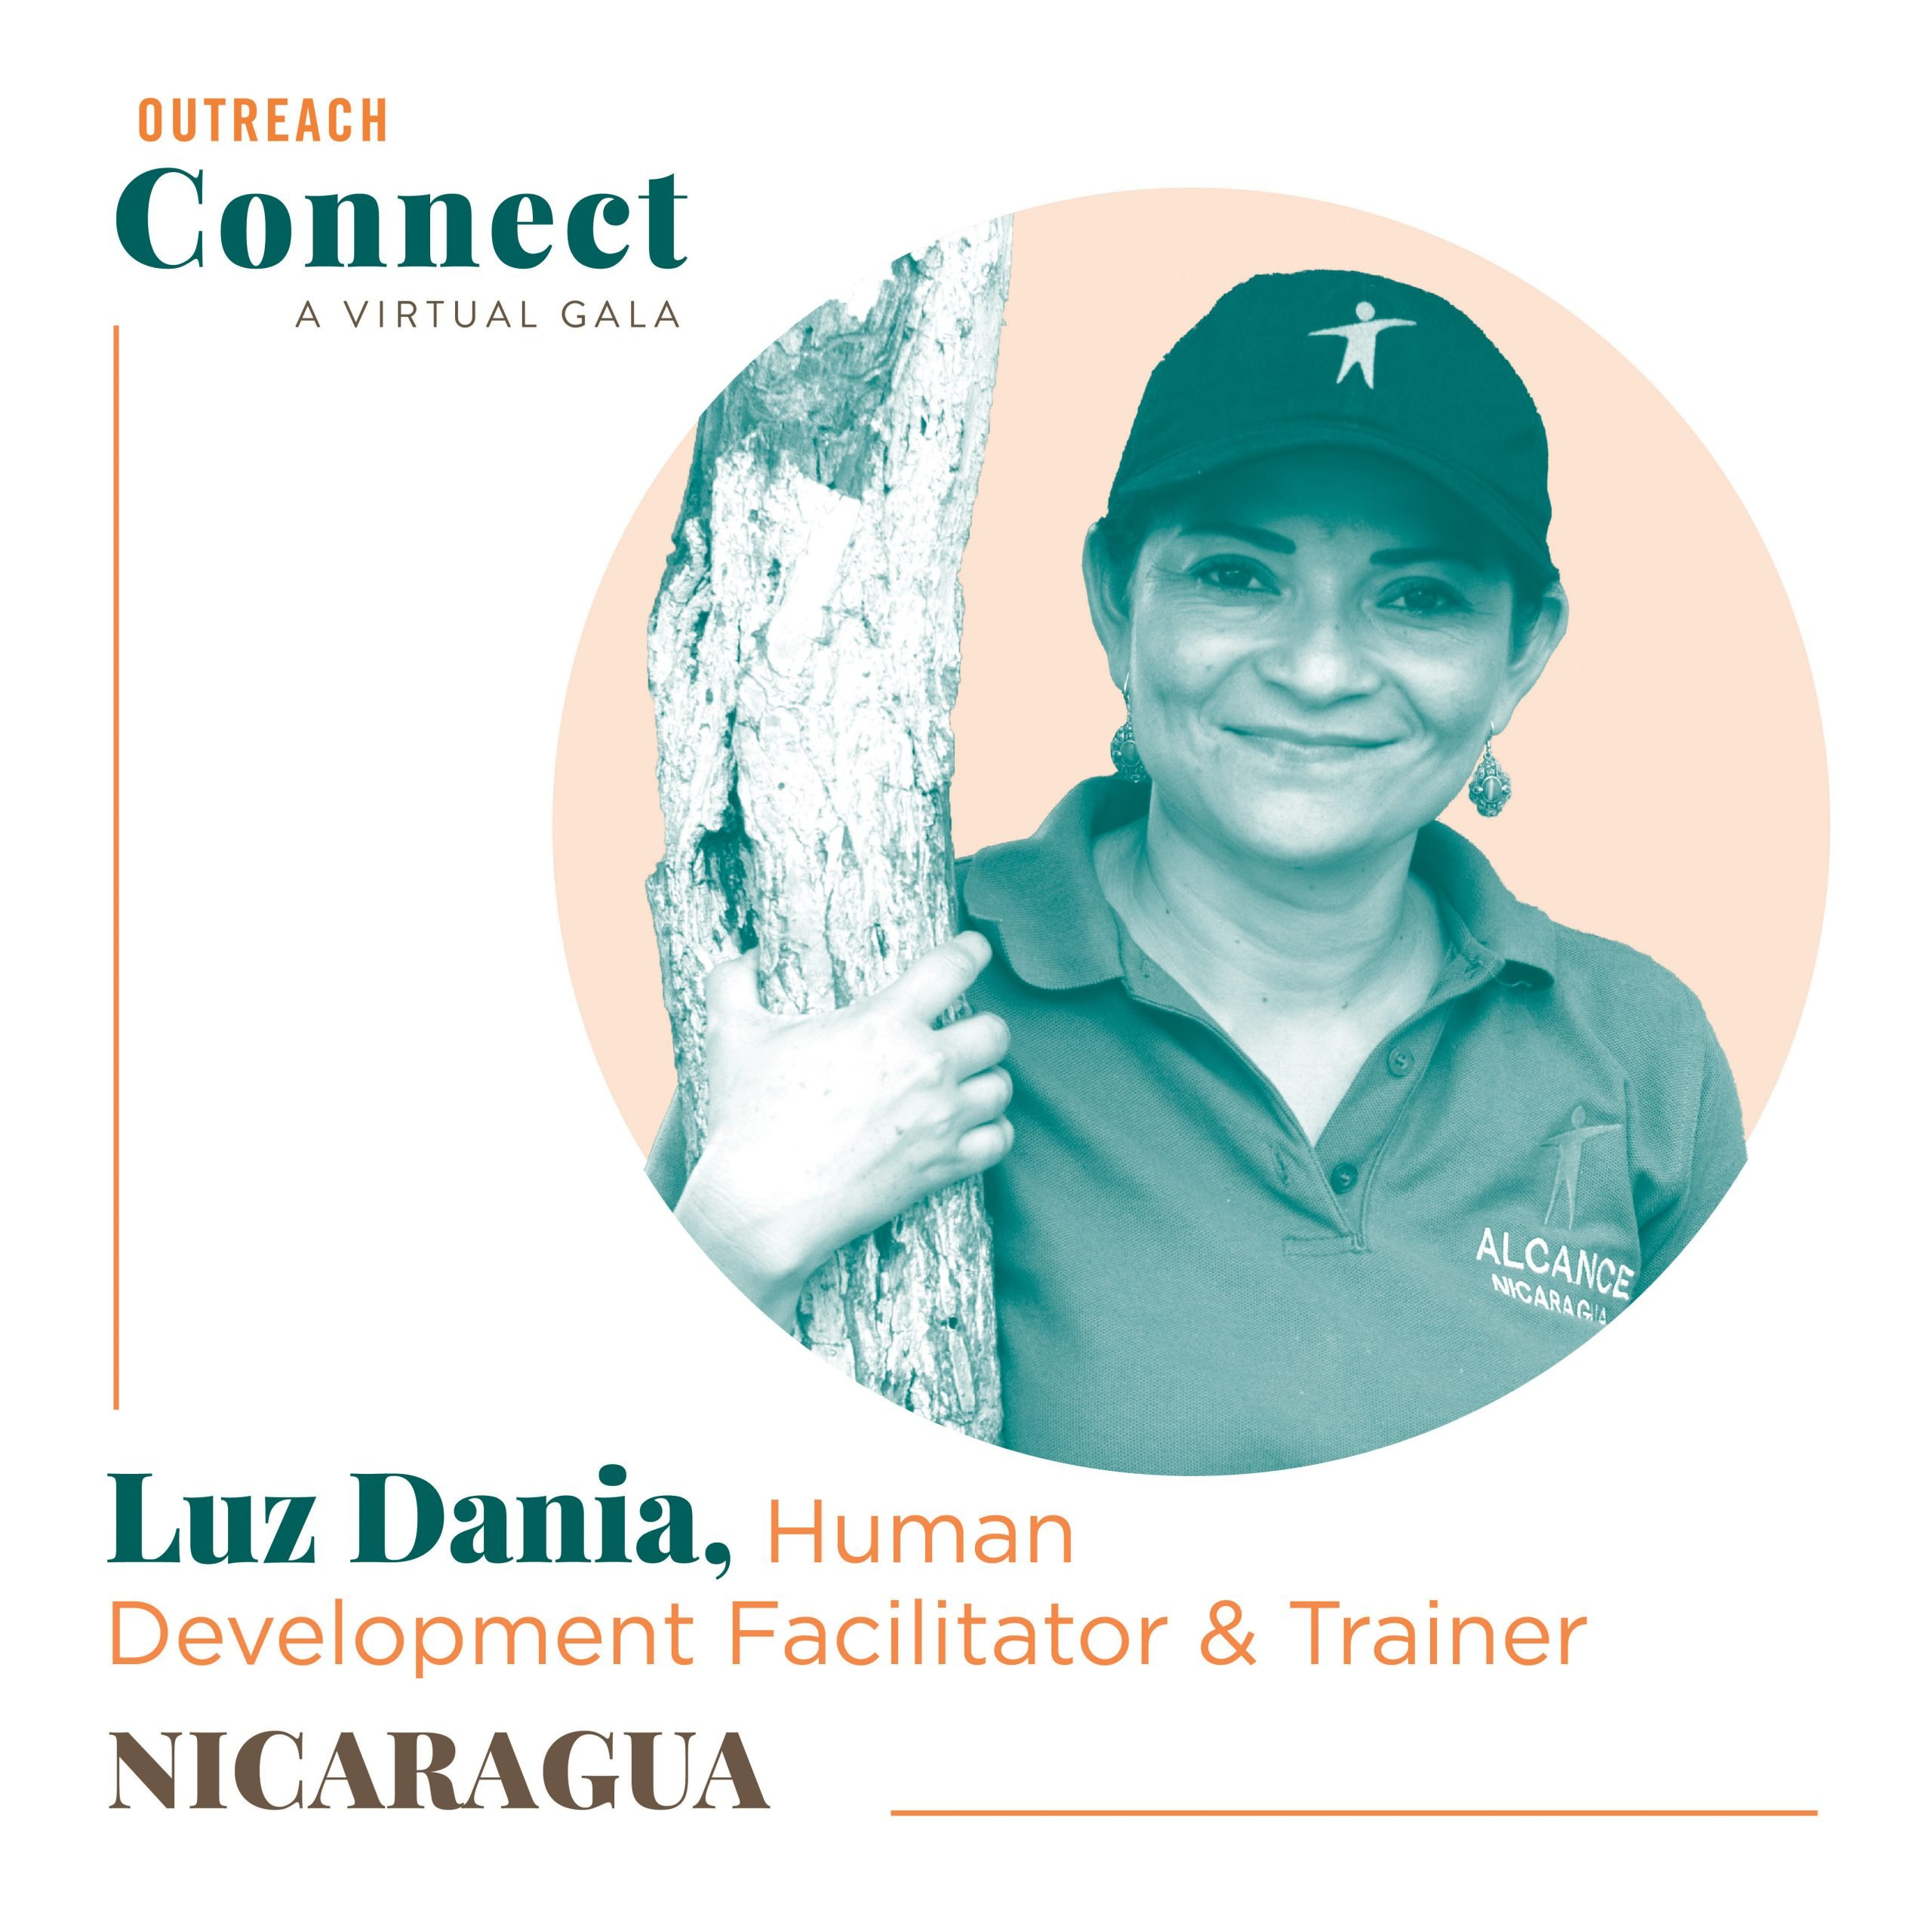 Luz Dania, an Outreach HDF from Nicaragua